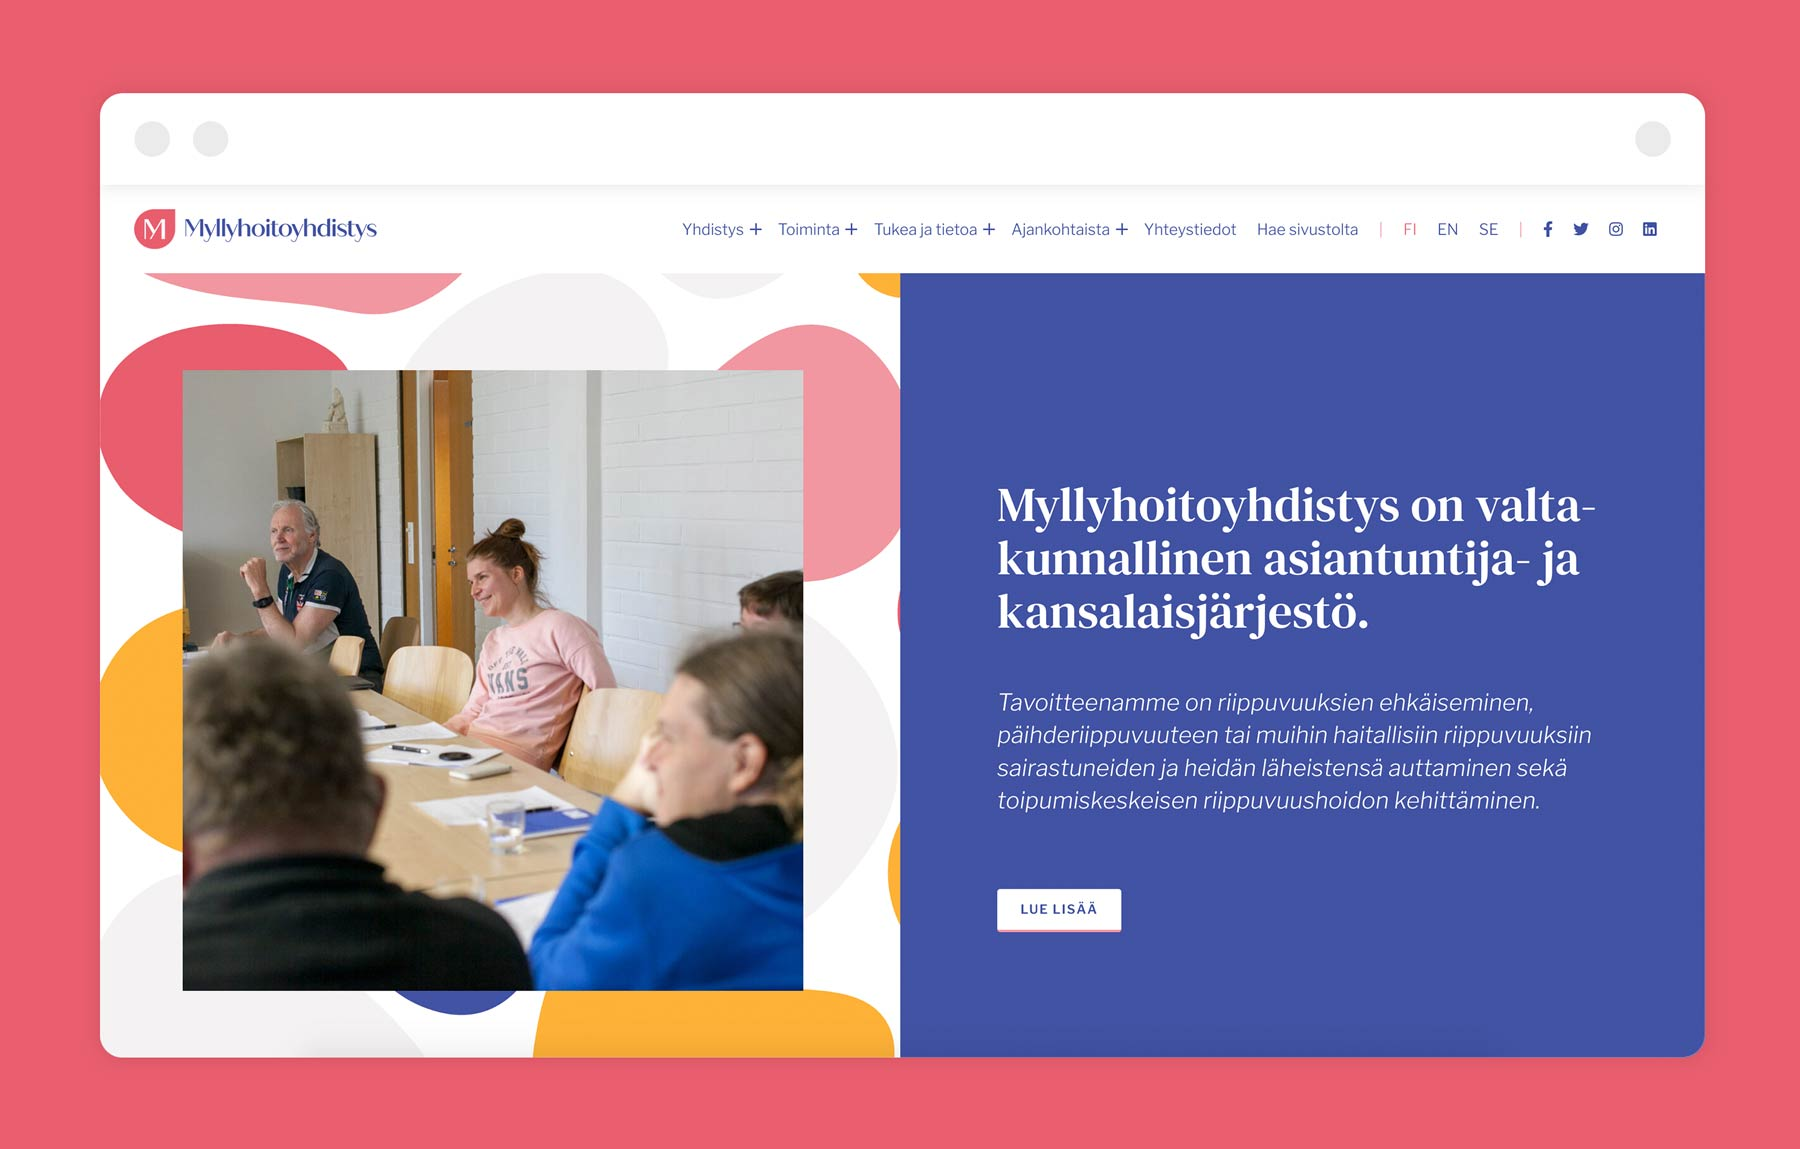 Myllyhoitoyhdistys identity and website, design by Kilda